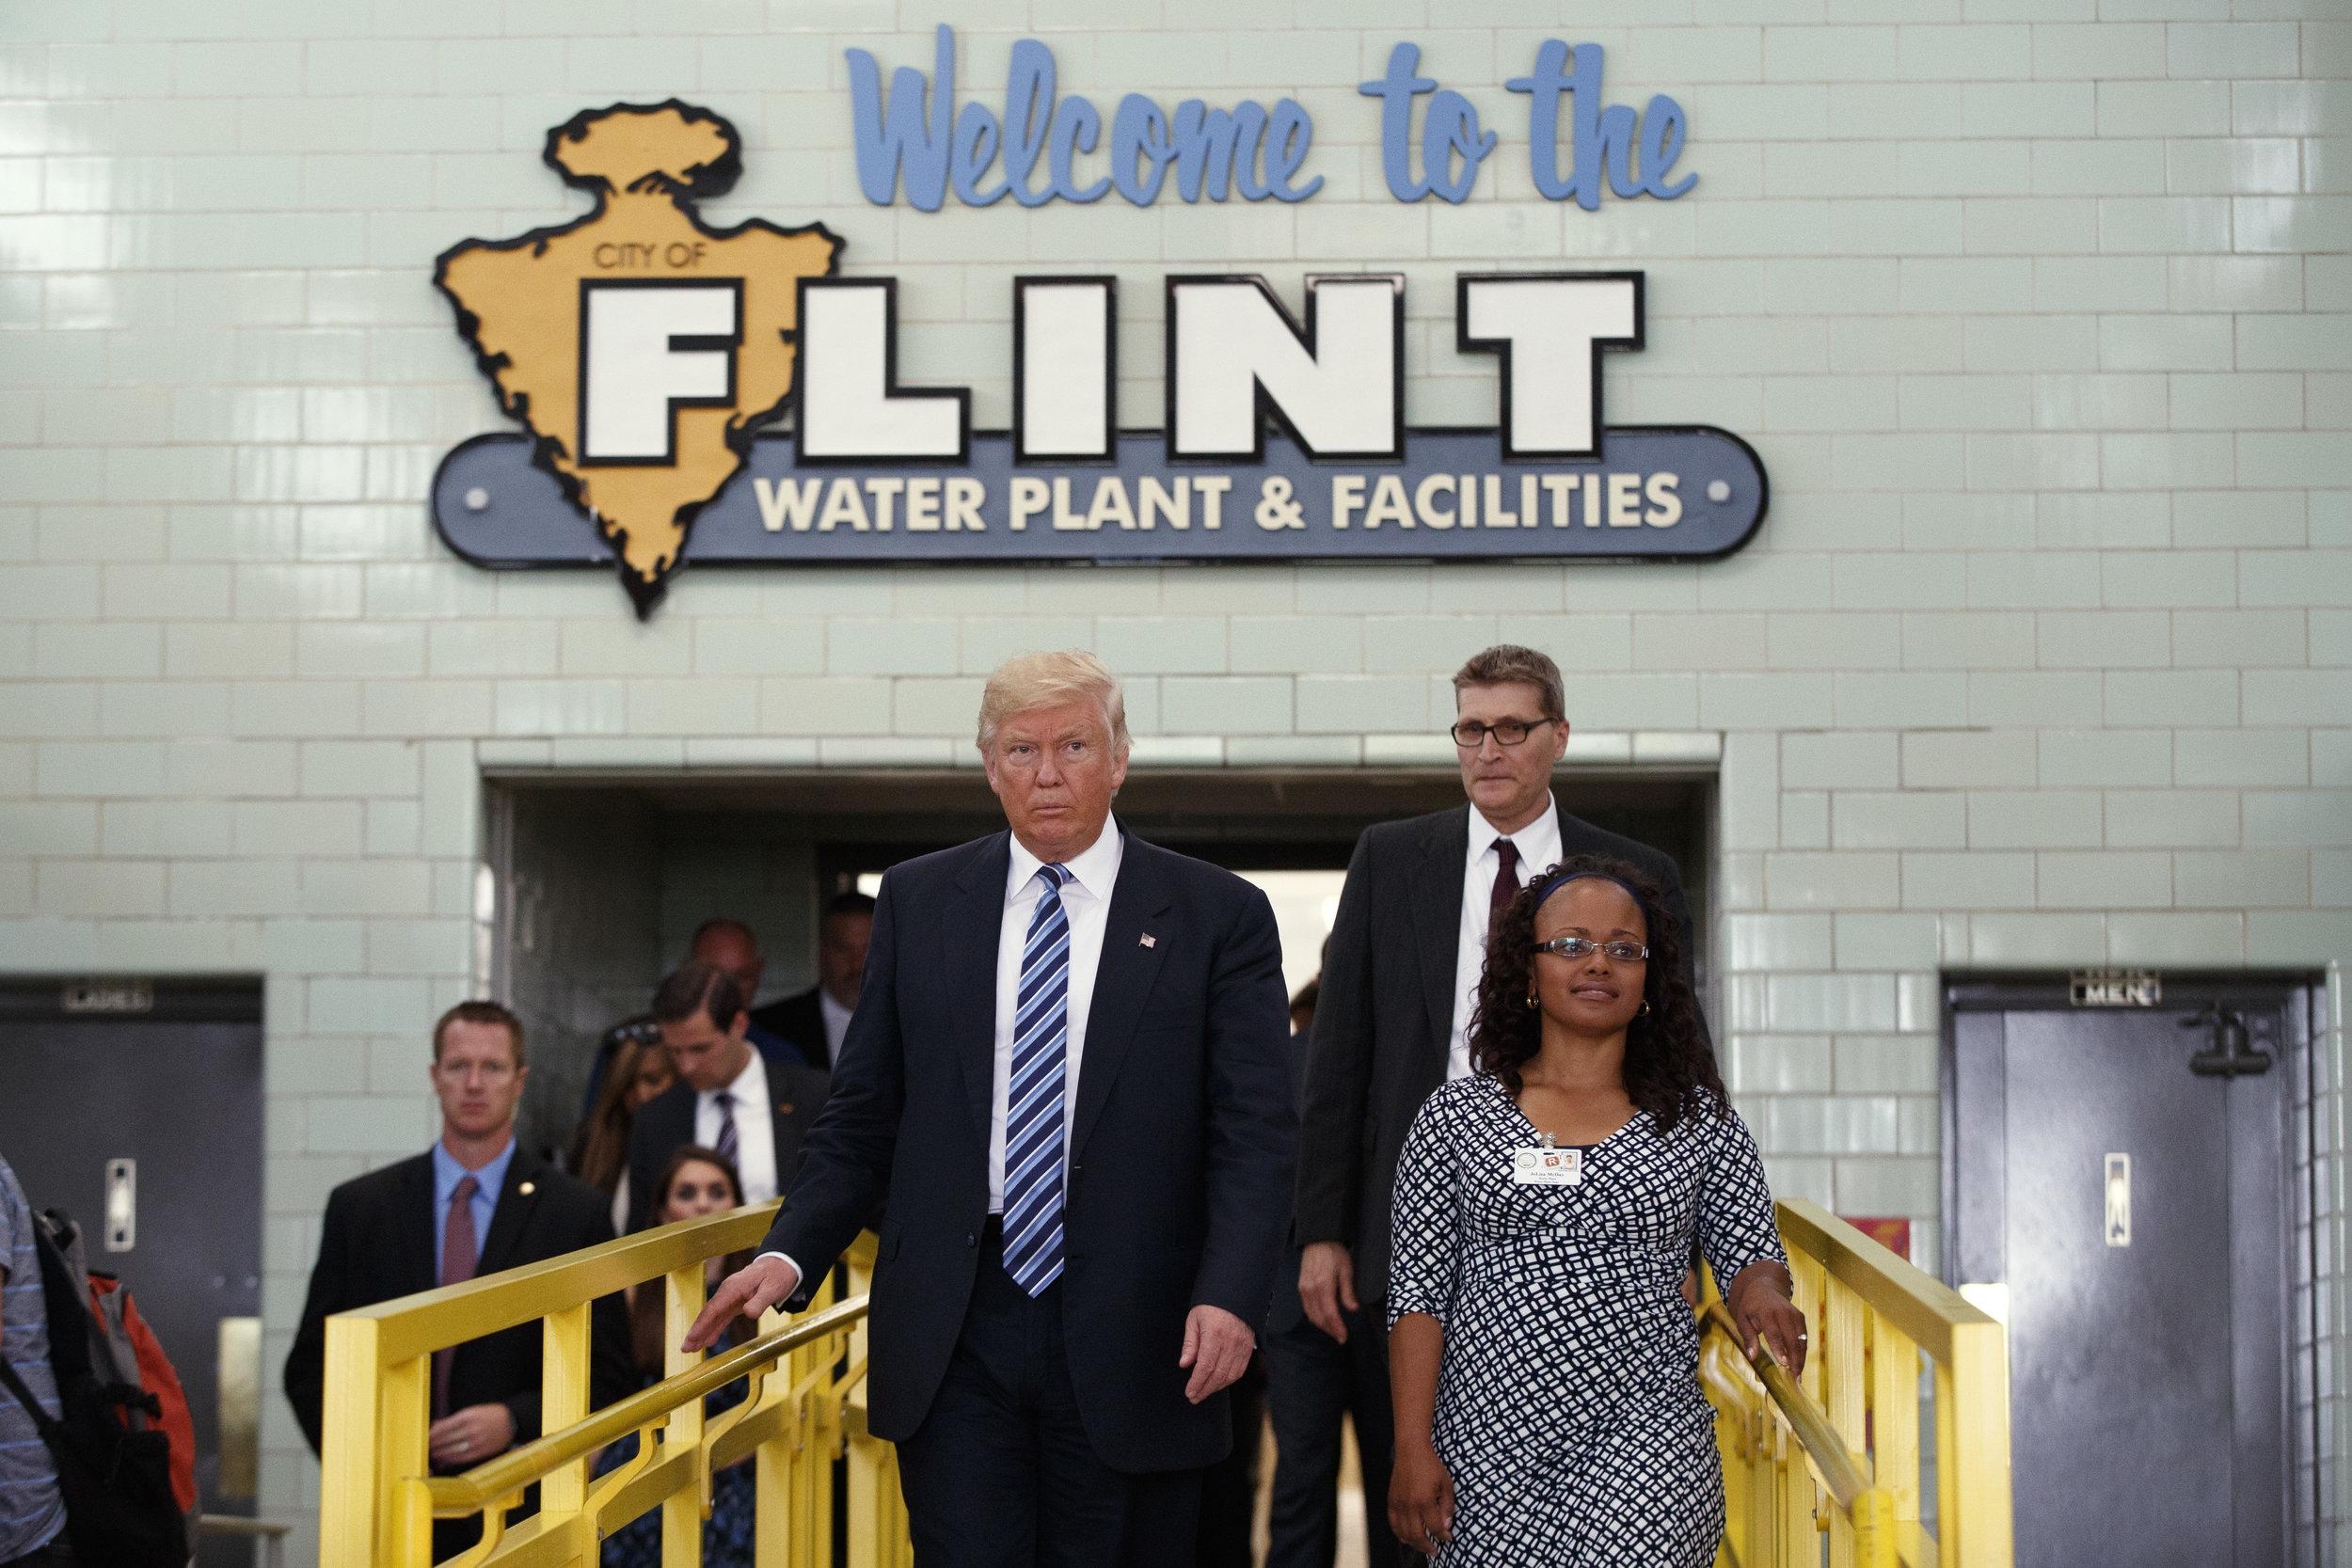 Donald Trump tours the Flint Water Plant and Facilities in Flint, Michigan, September 14, 2016.  Credit: REUTERS/Mike Segar